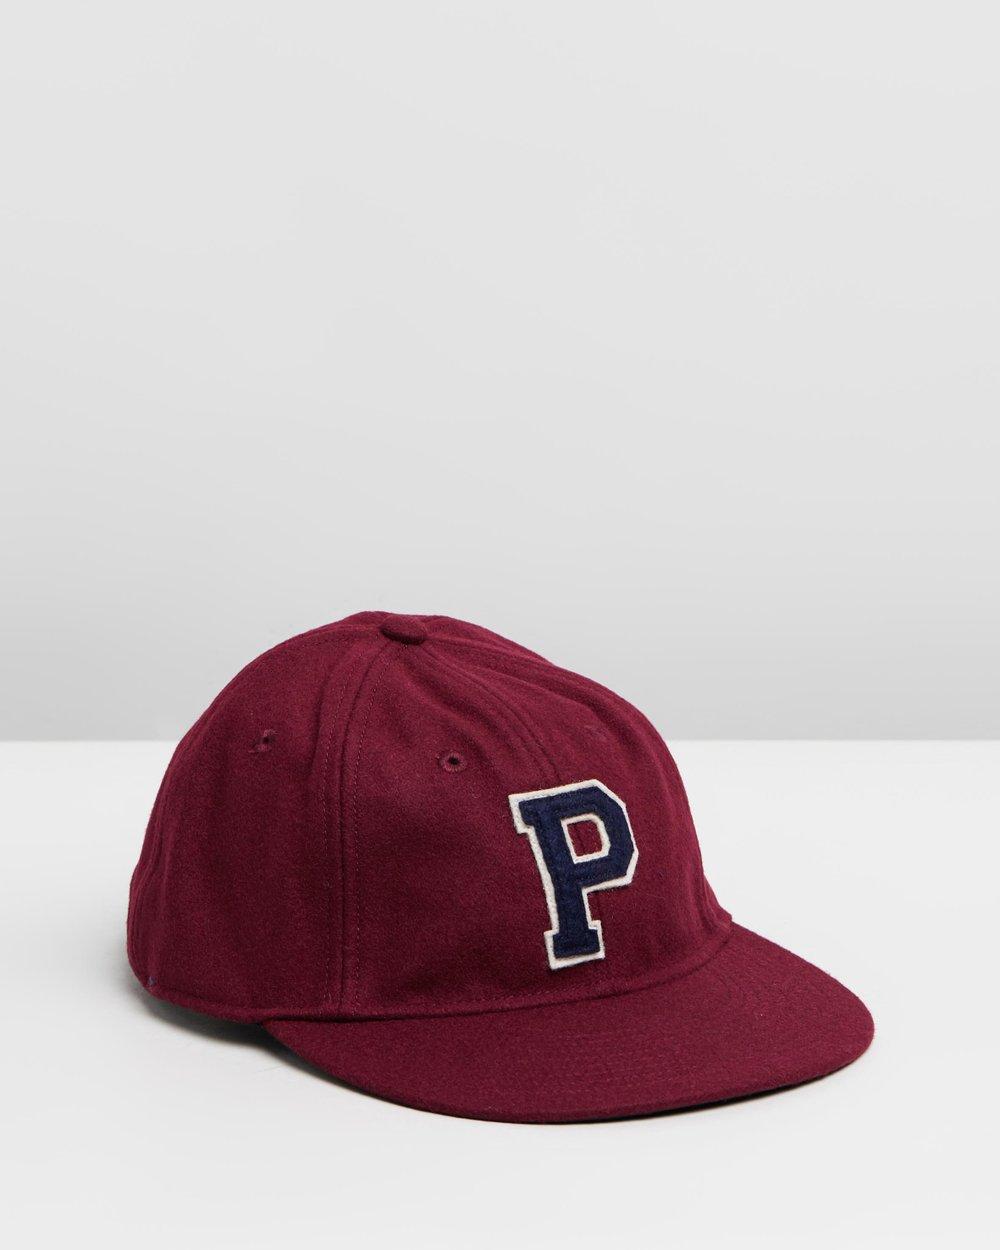 e4c7a61ddc616a Wool-Blend Baseball Cap by Polo Ralph Lauren Online | THE ICONIC | Australia